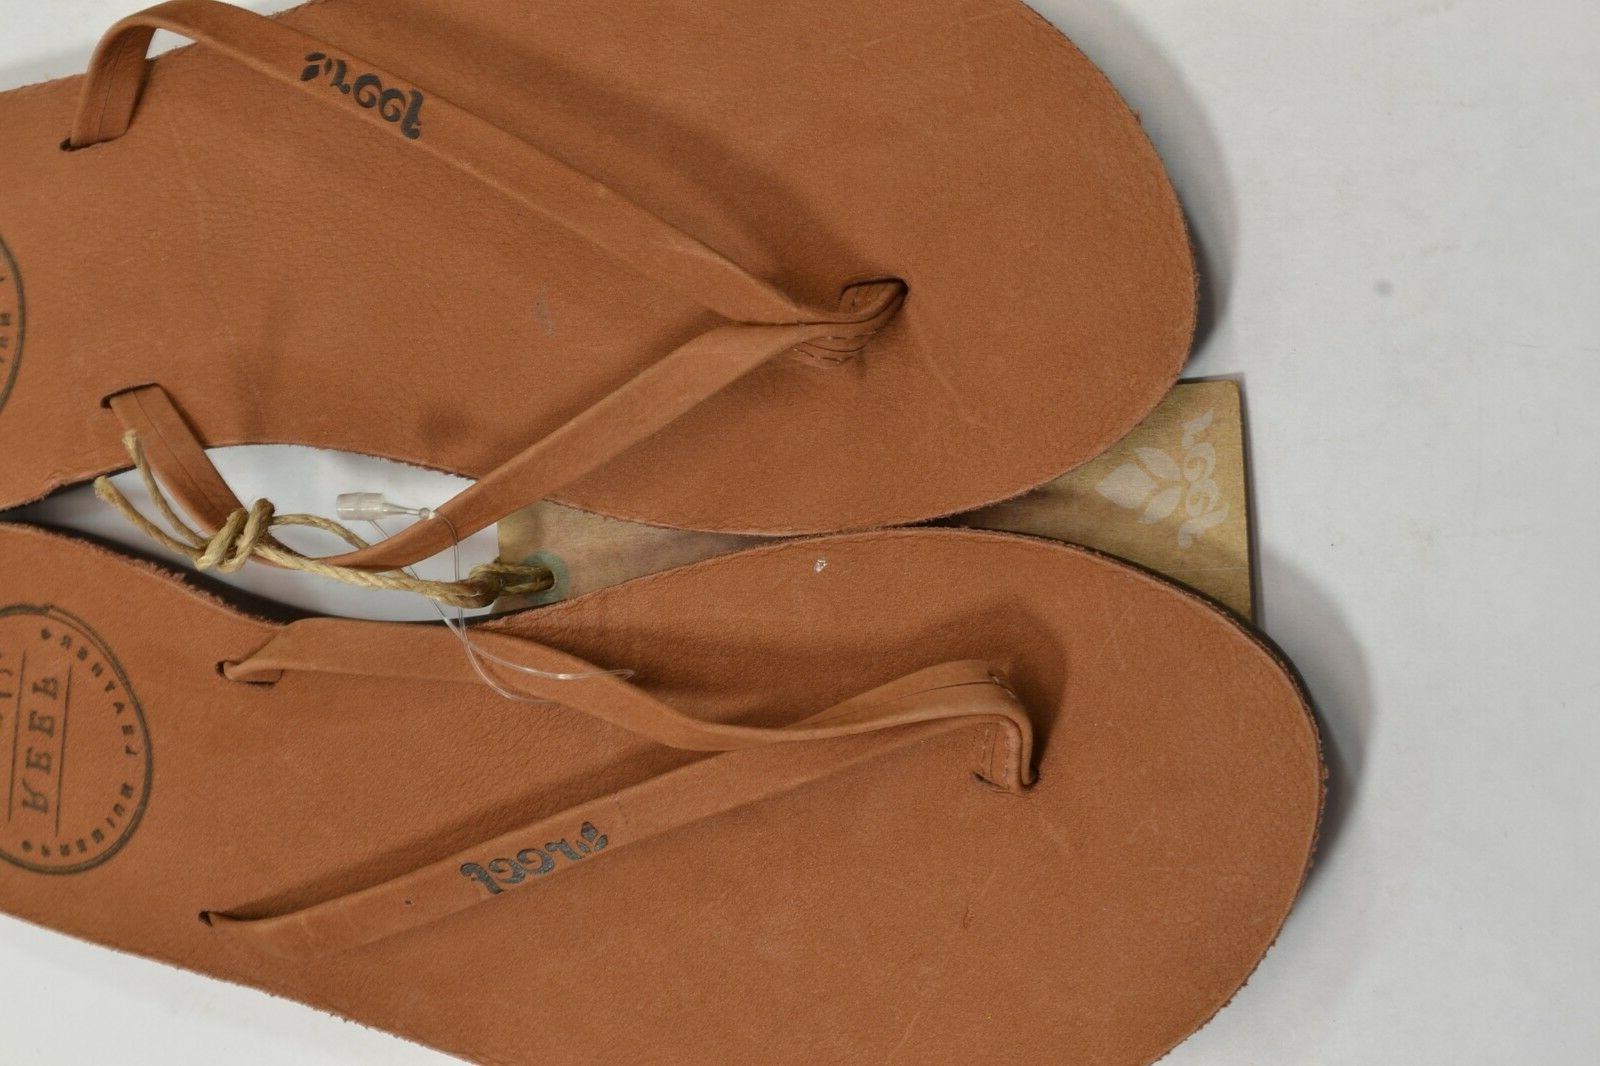 Reef UPTOWN Leather Flip Discount Sandals